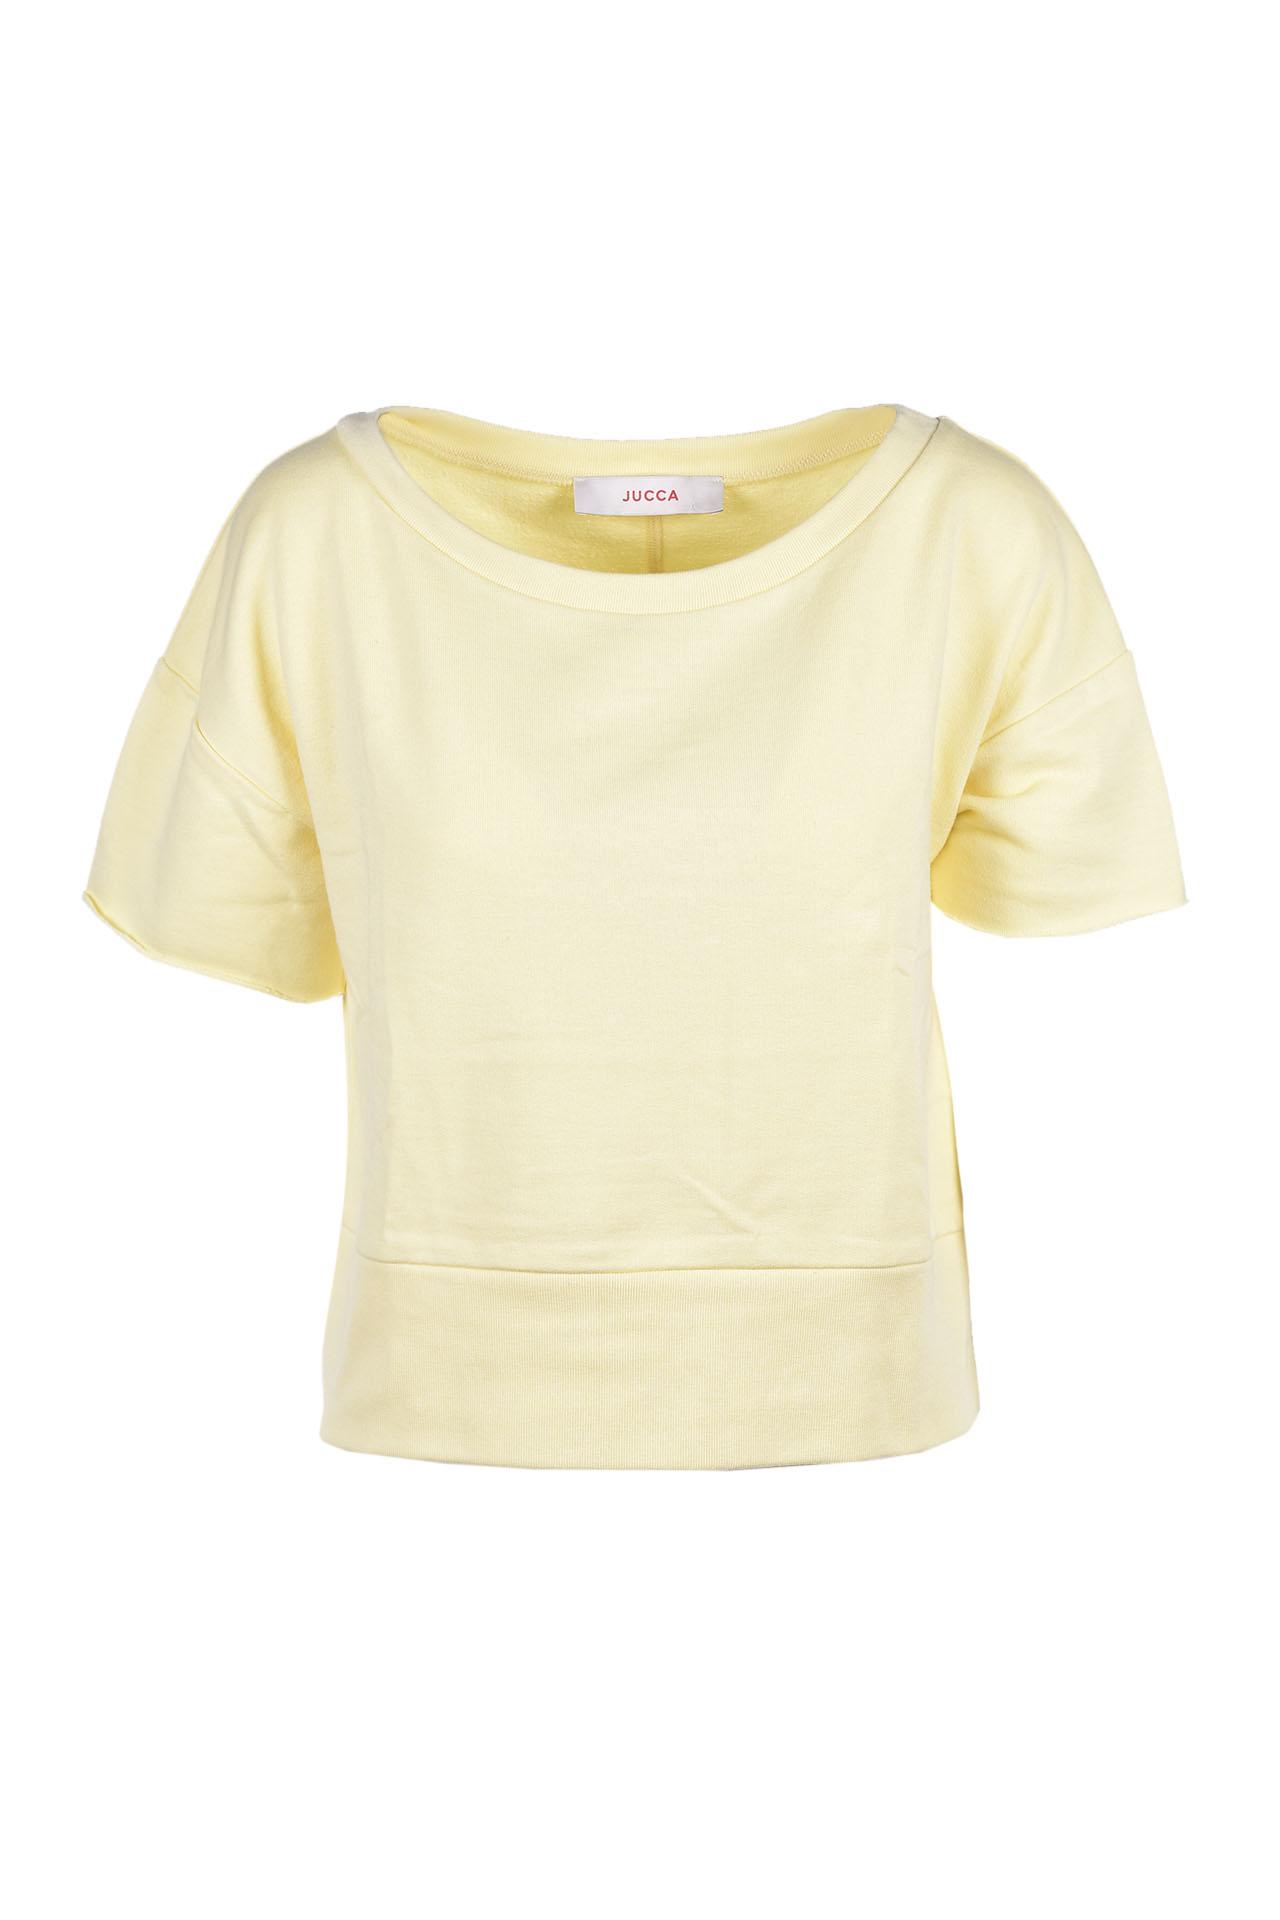 Short sweatshirt with wide neck - shy JUCCA | Sweatshirt | J31180291636